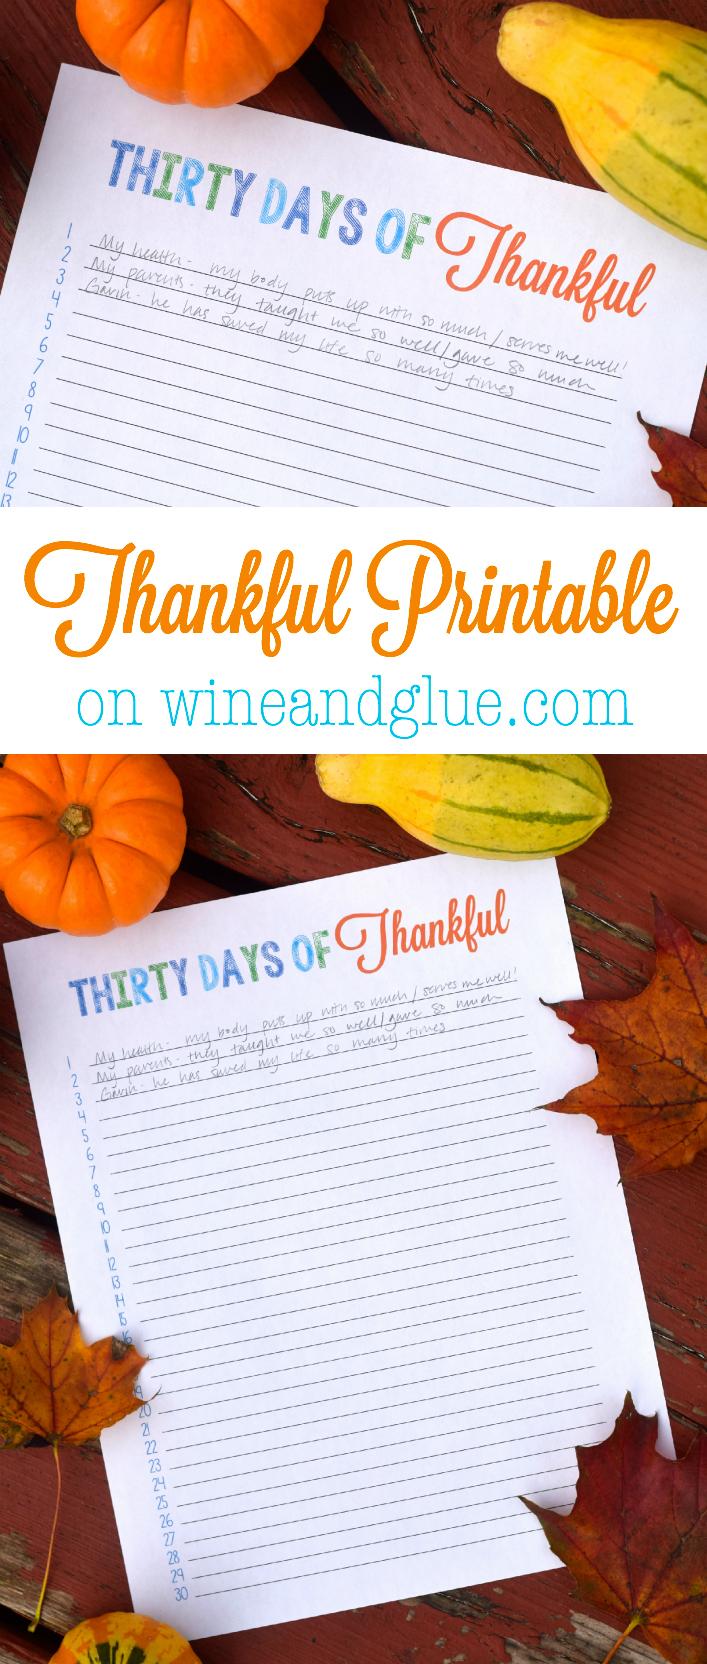 30 Days of Thankful free Printable